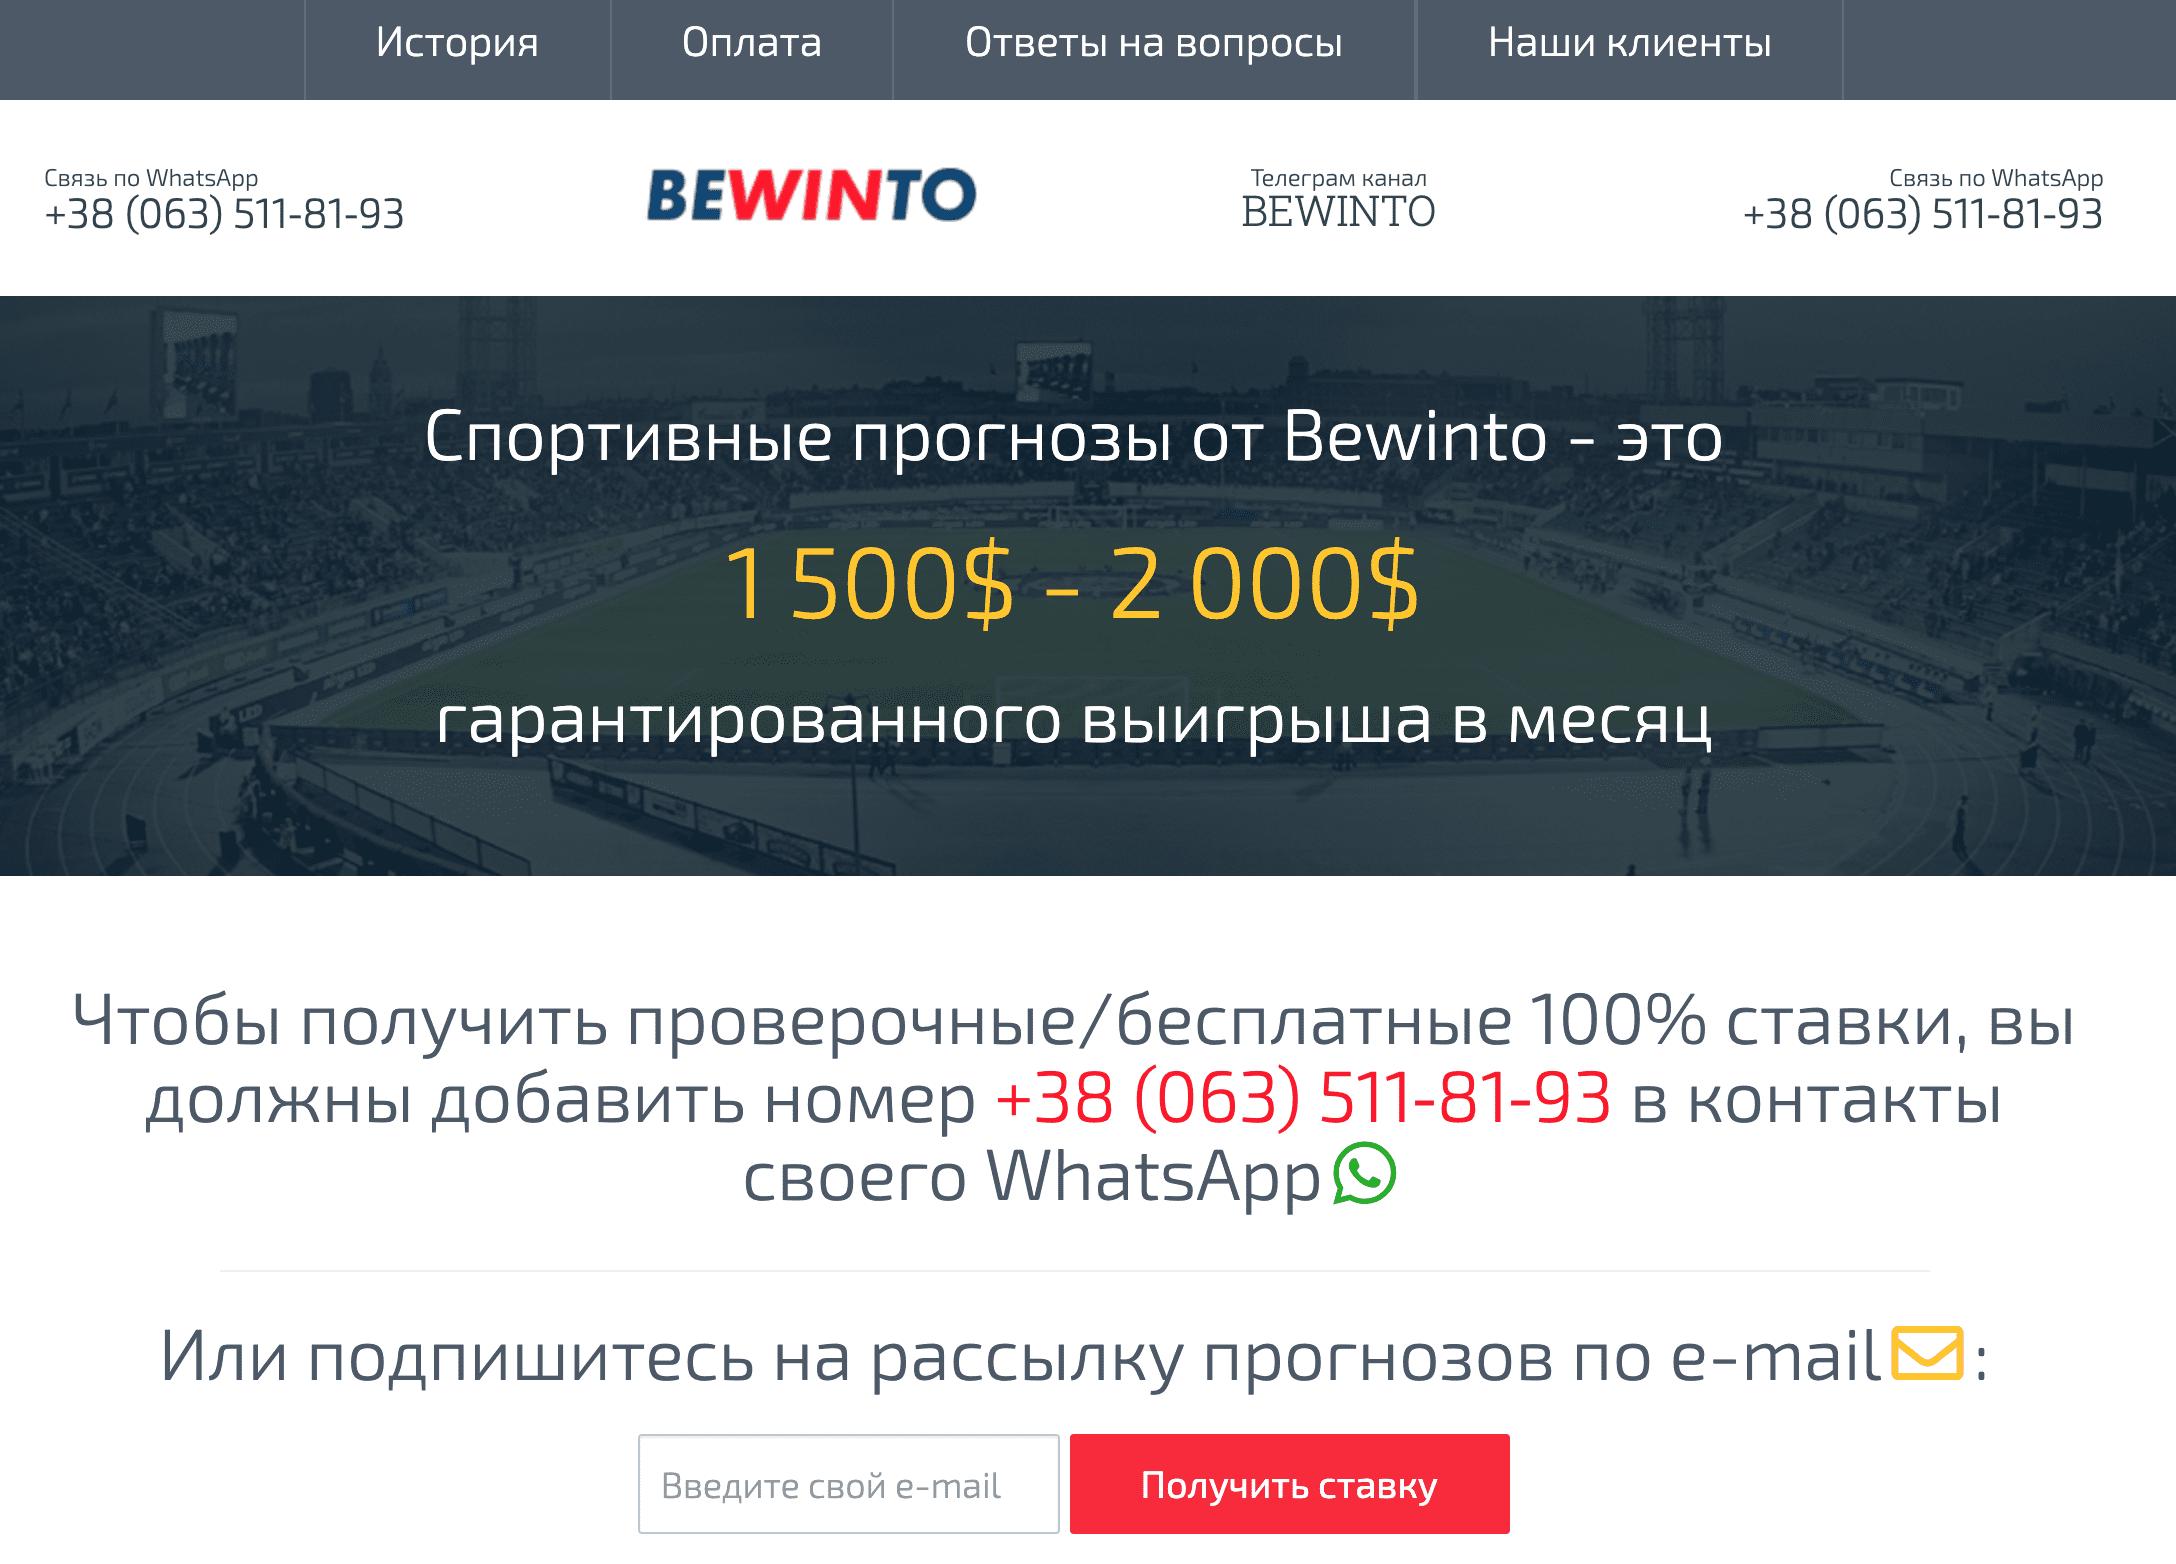 Главная сраница сайта Bewinto(Бевинто)